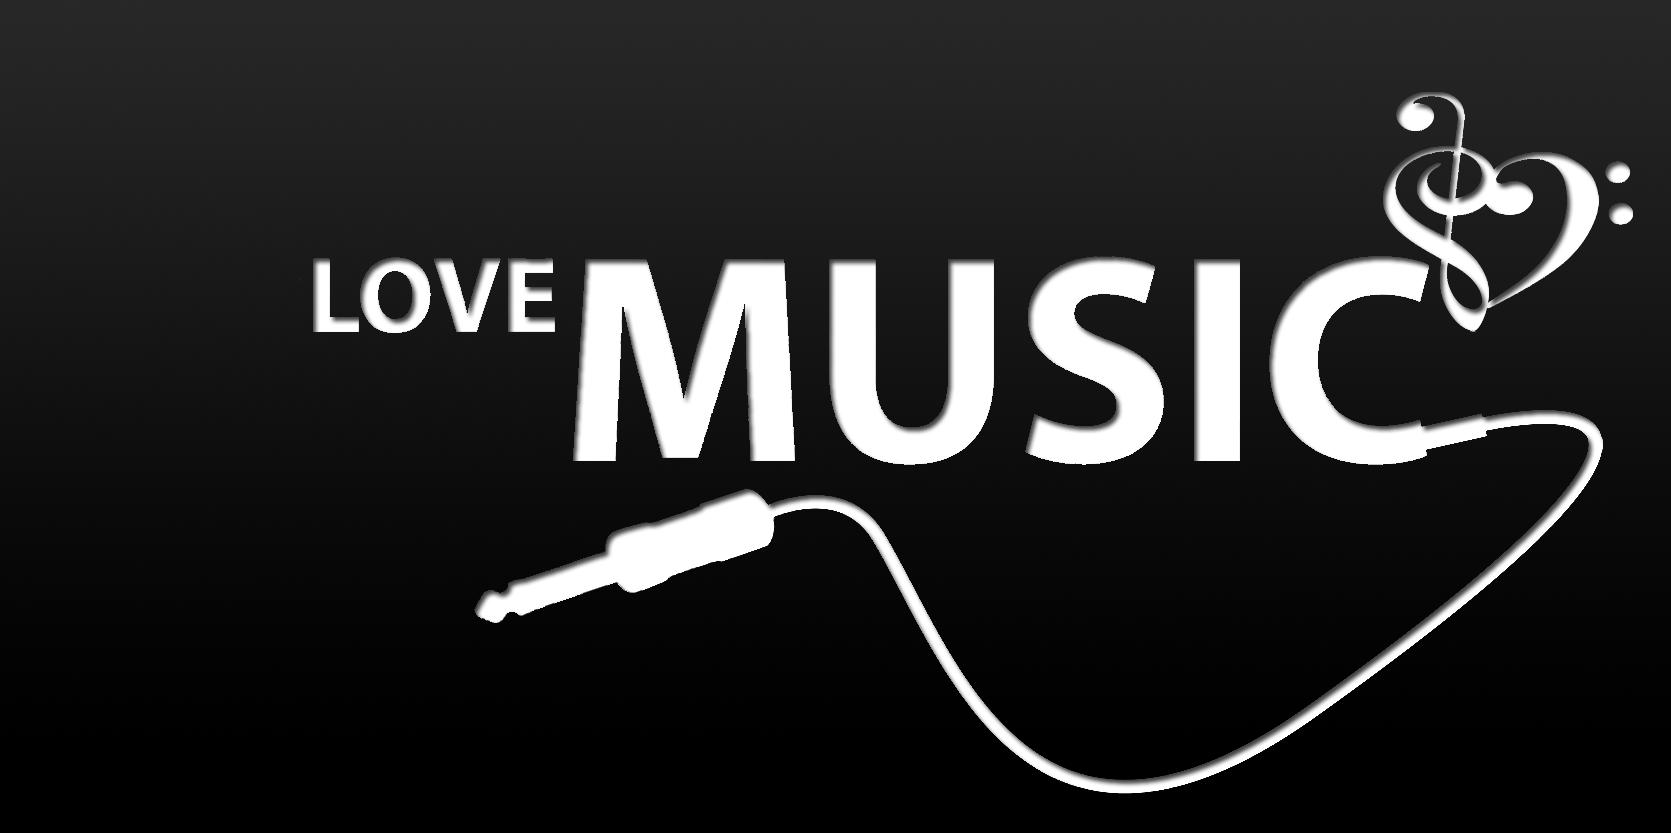 Music Quotes: Best Quotes About Music. QuotesGram